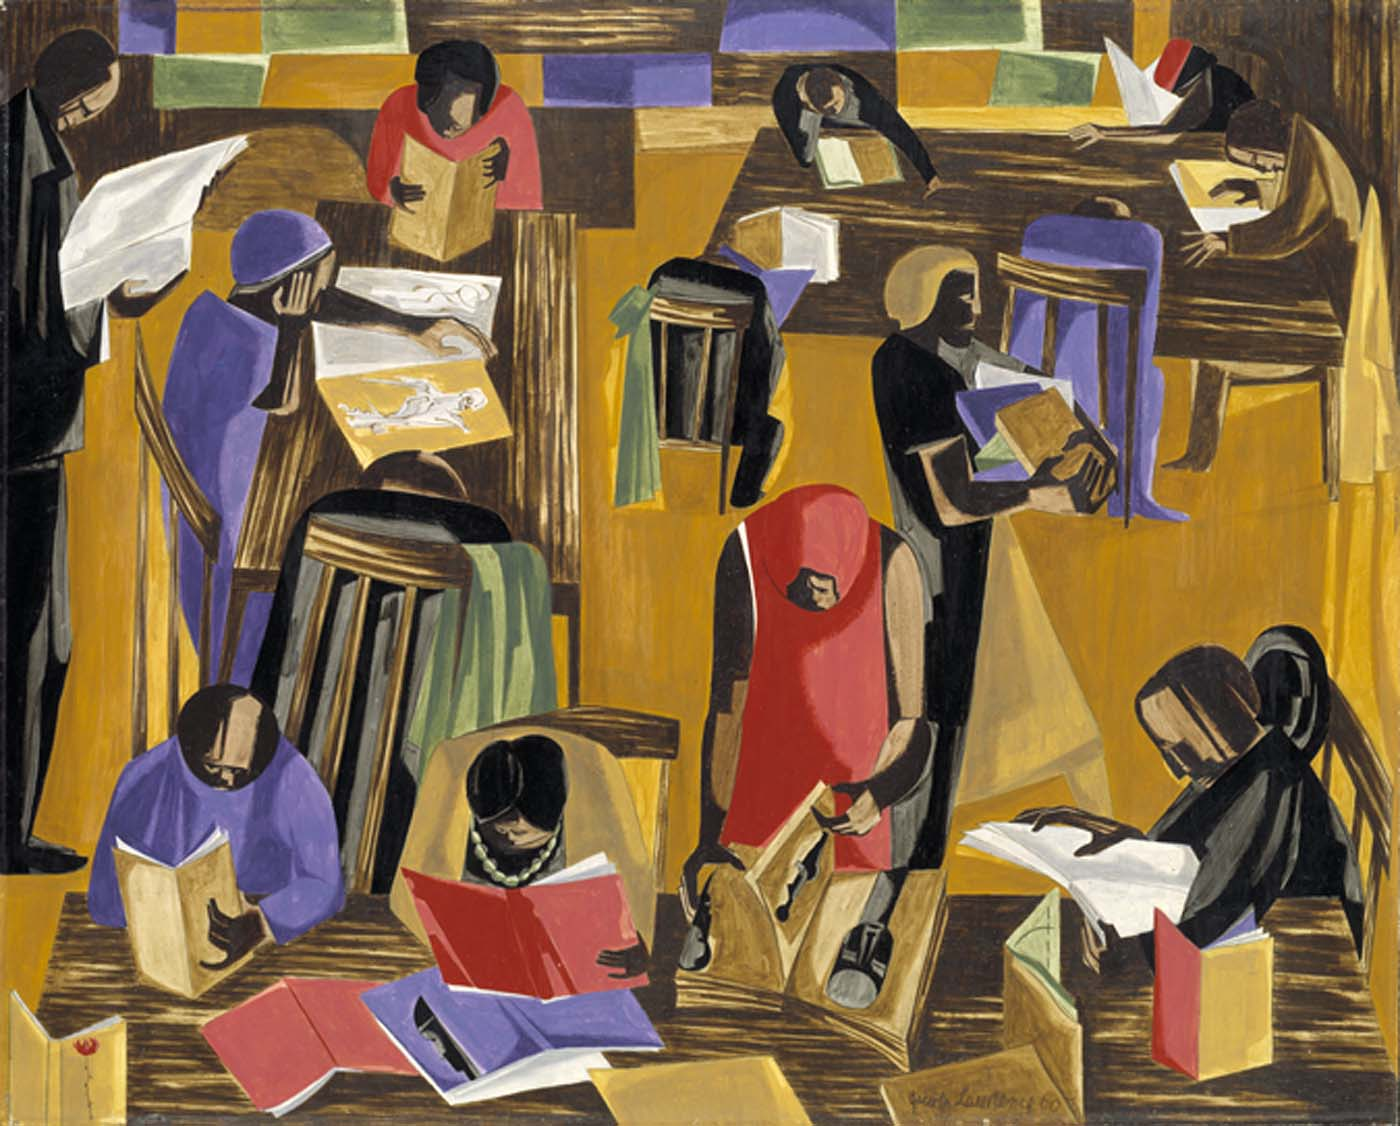 education during the harlem renaissance